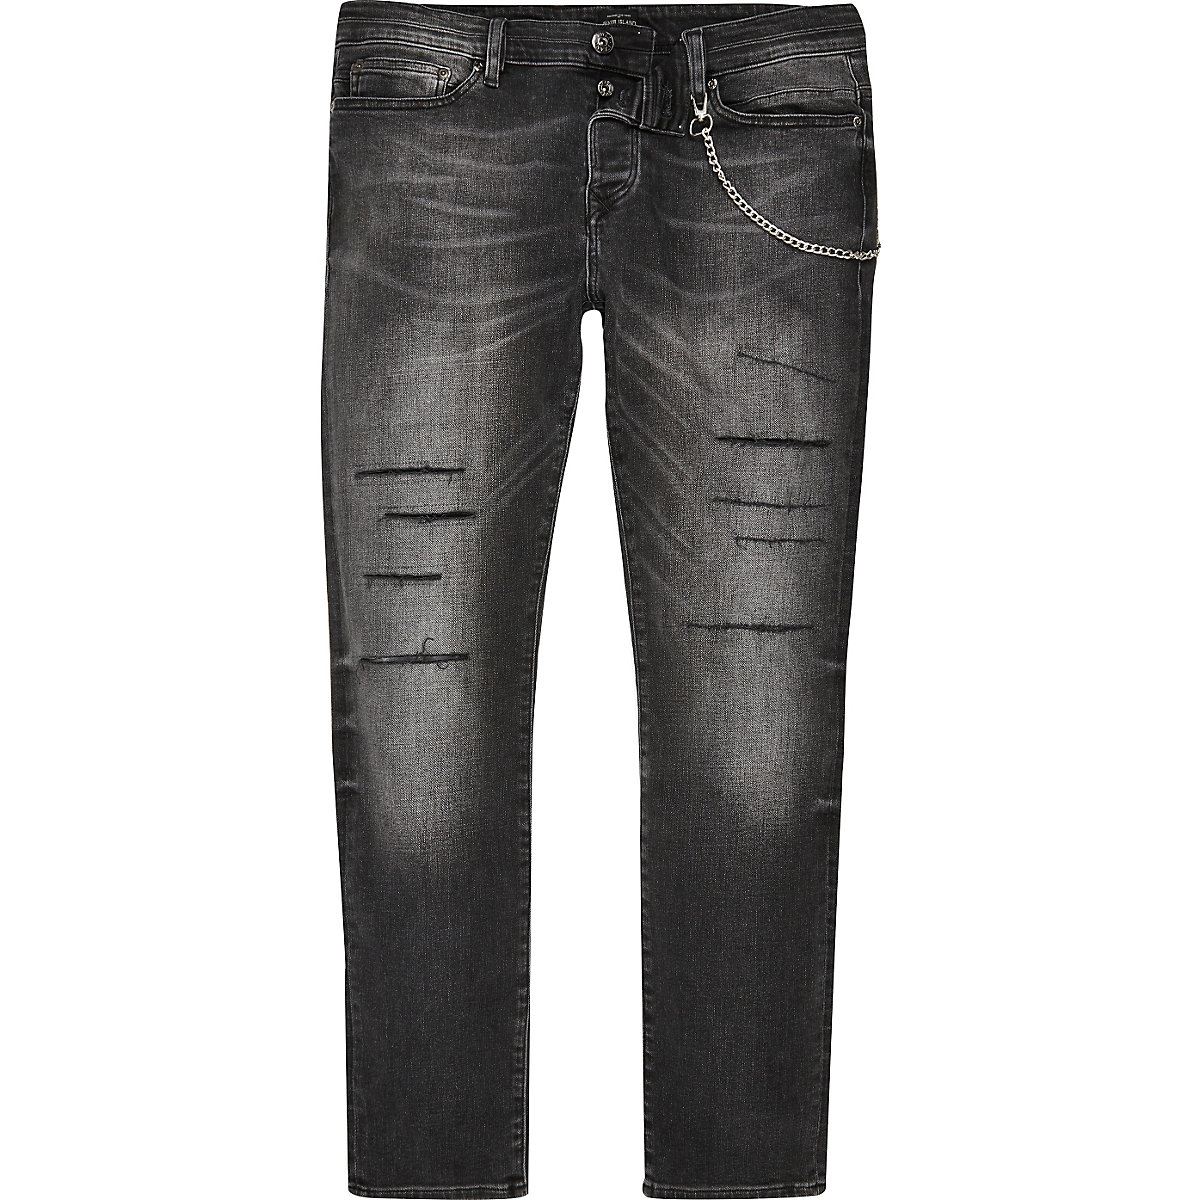 Black wash Sid cigarette skinny jeans